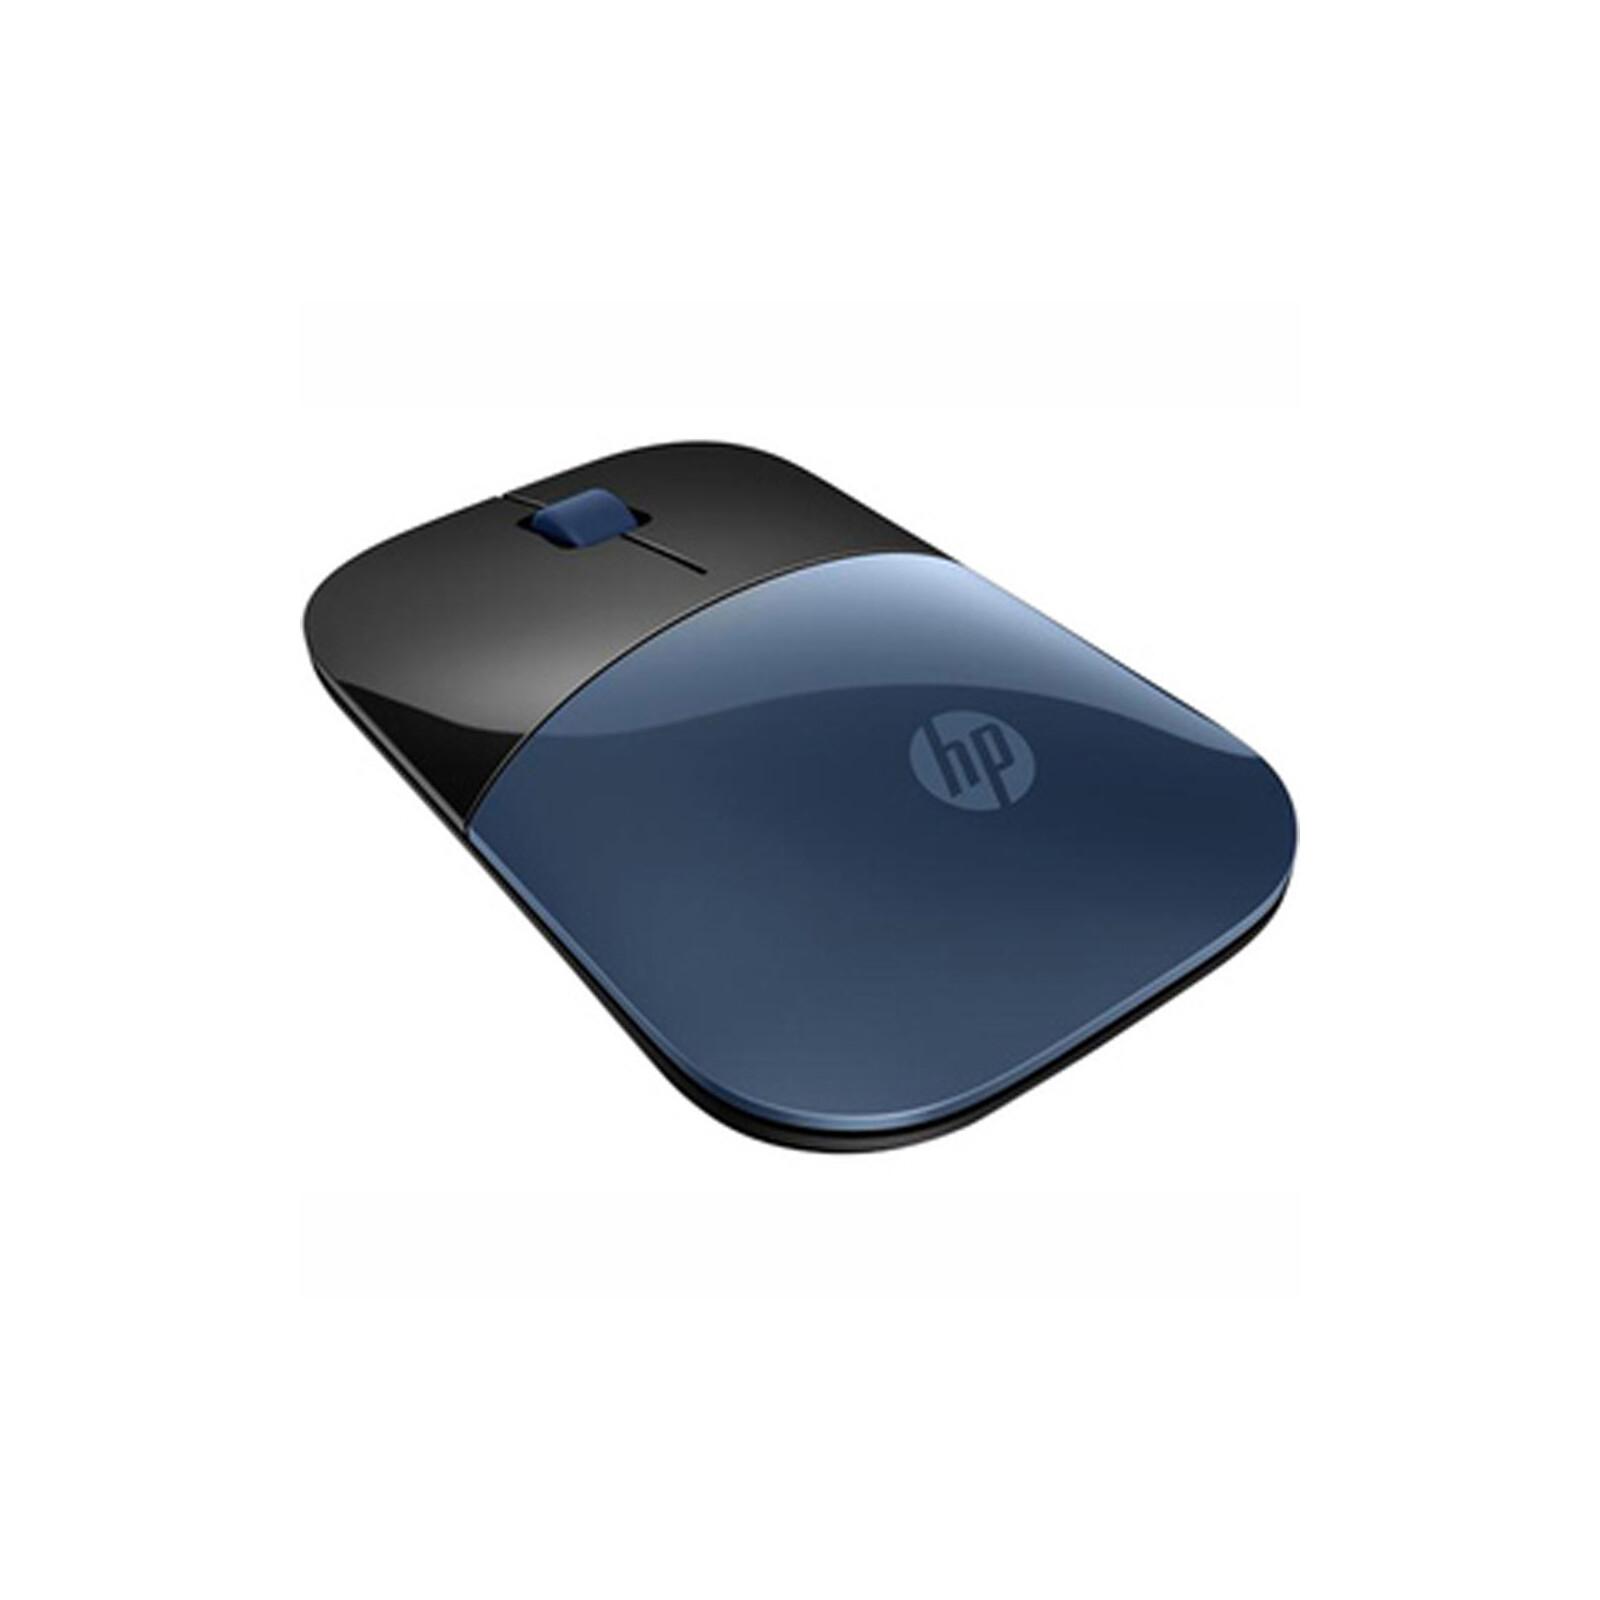 HP Z3700 Blue Wireless Maus